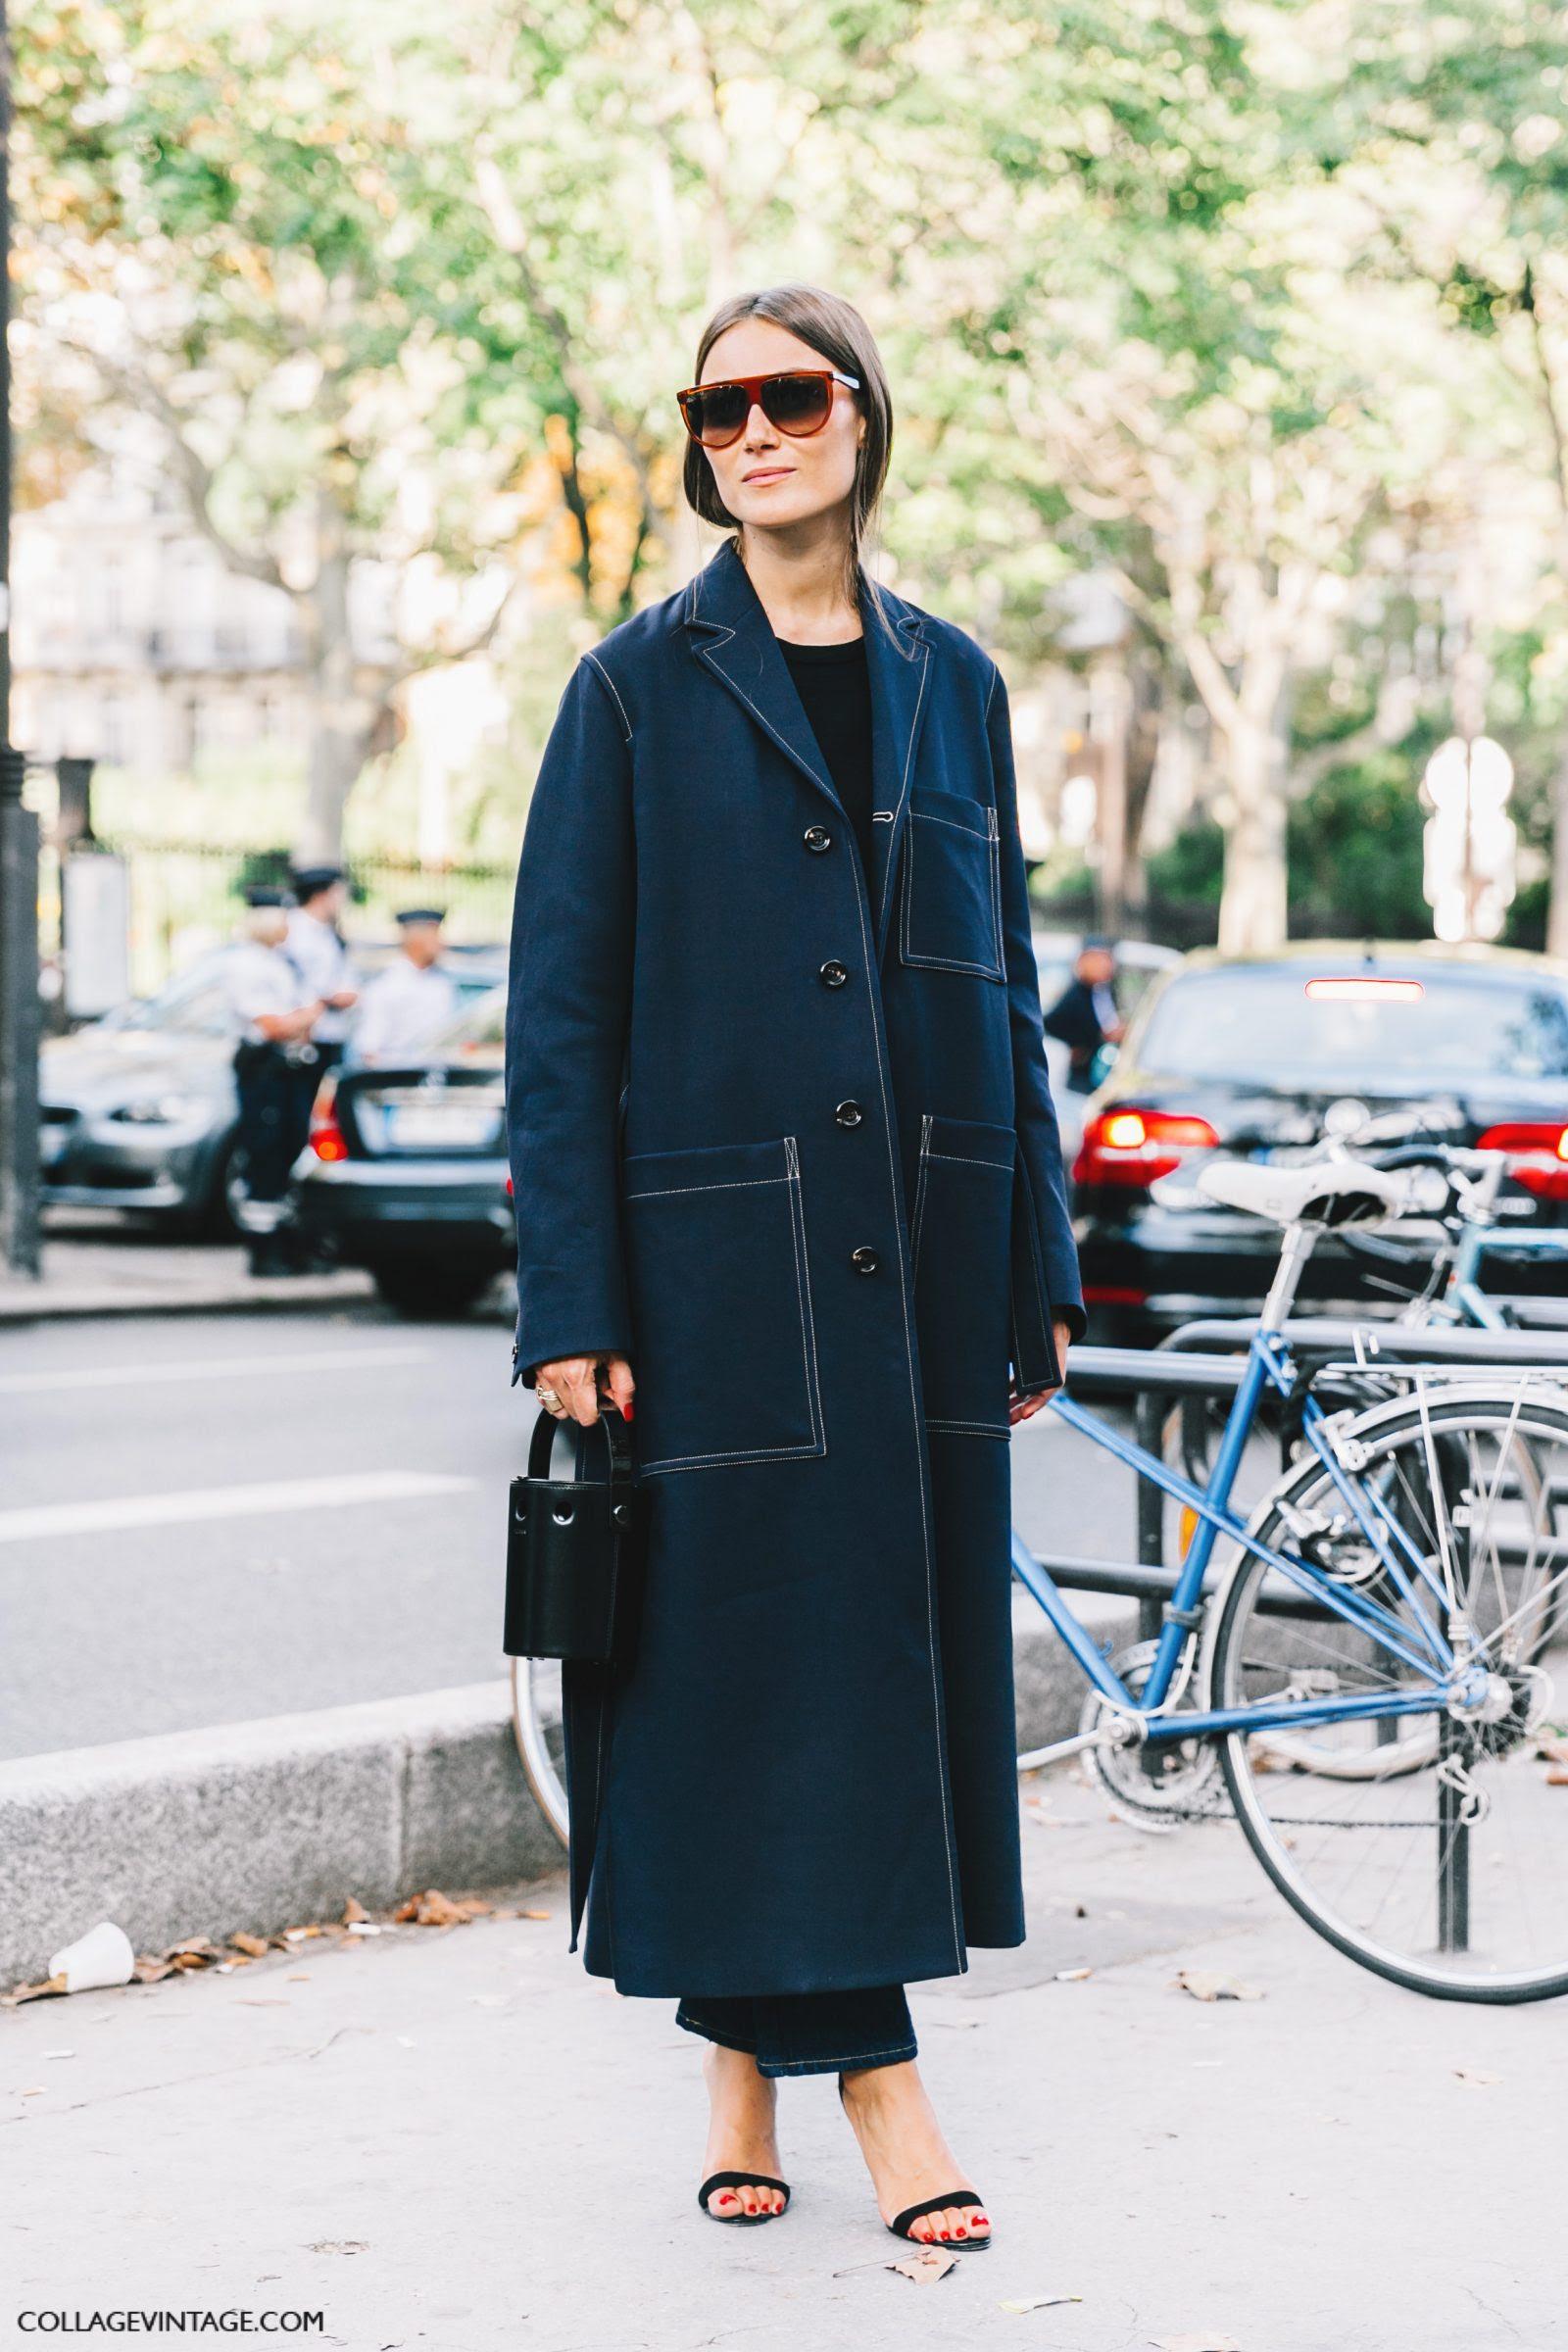 pfw-paris_fashion_week_ss17-street_style-outfits-collage_vintage-rochas-courreges-dries_van_noten-lanvin-guy_laroche-237